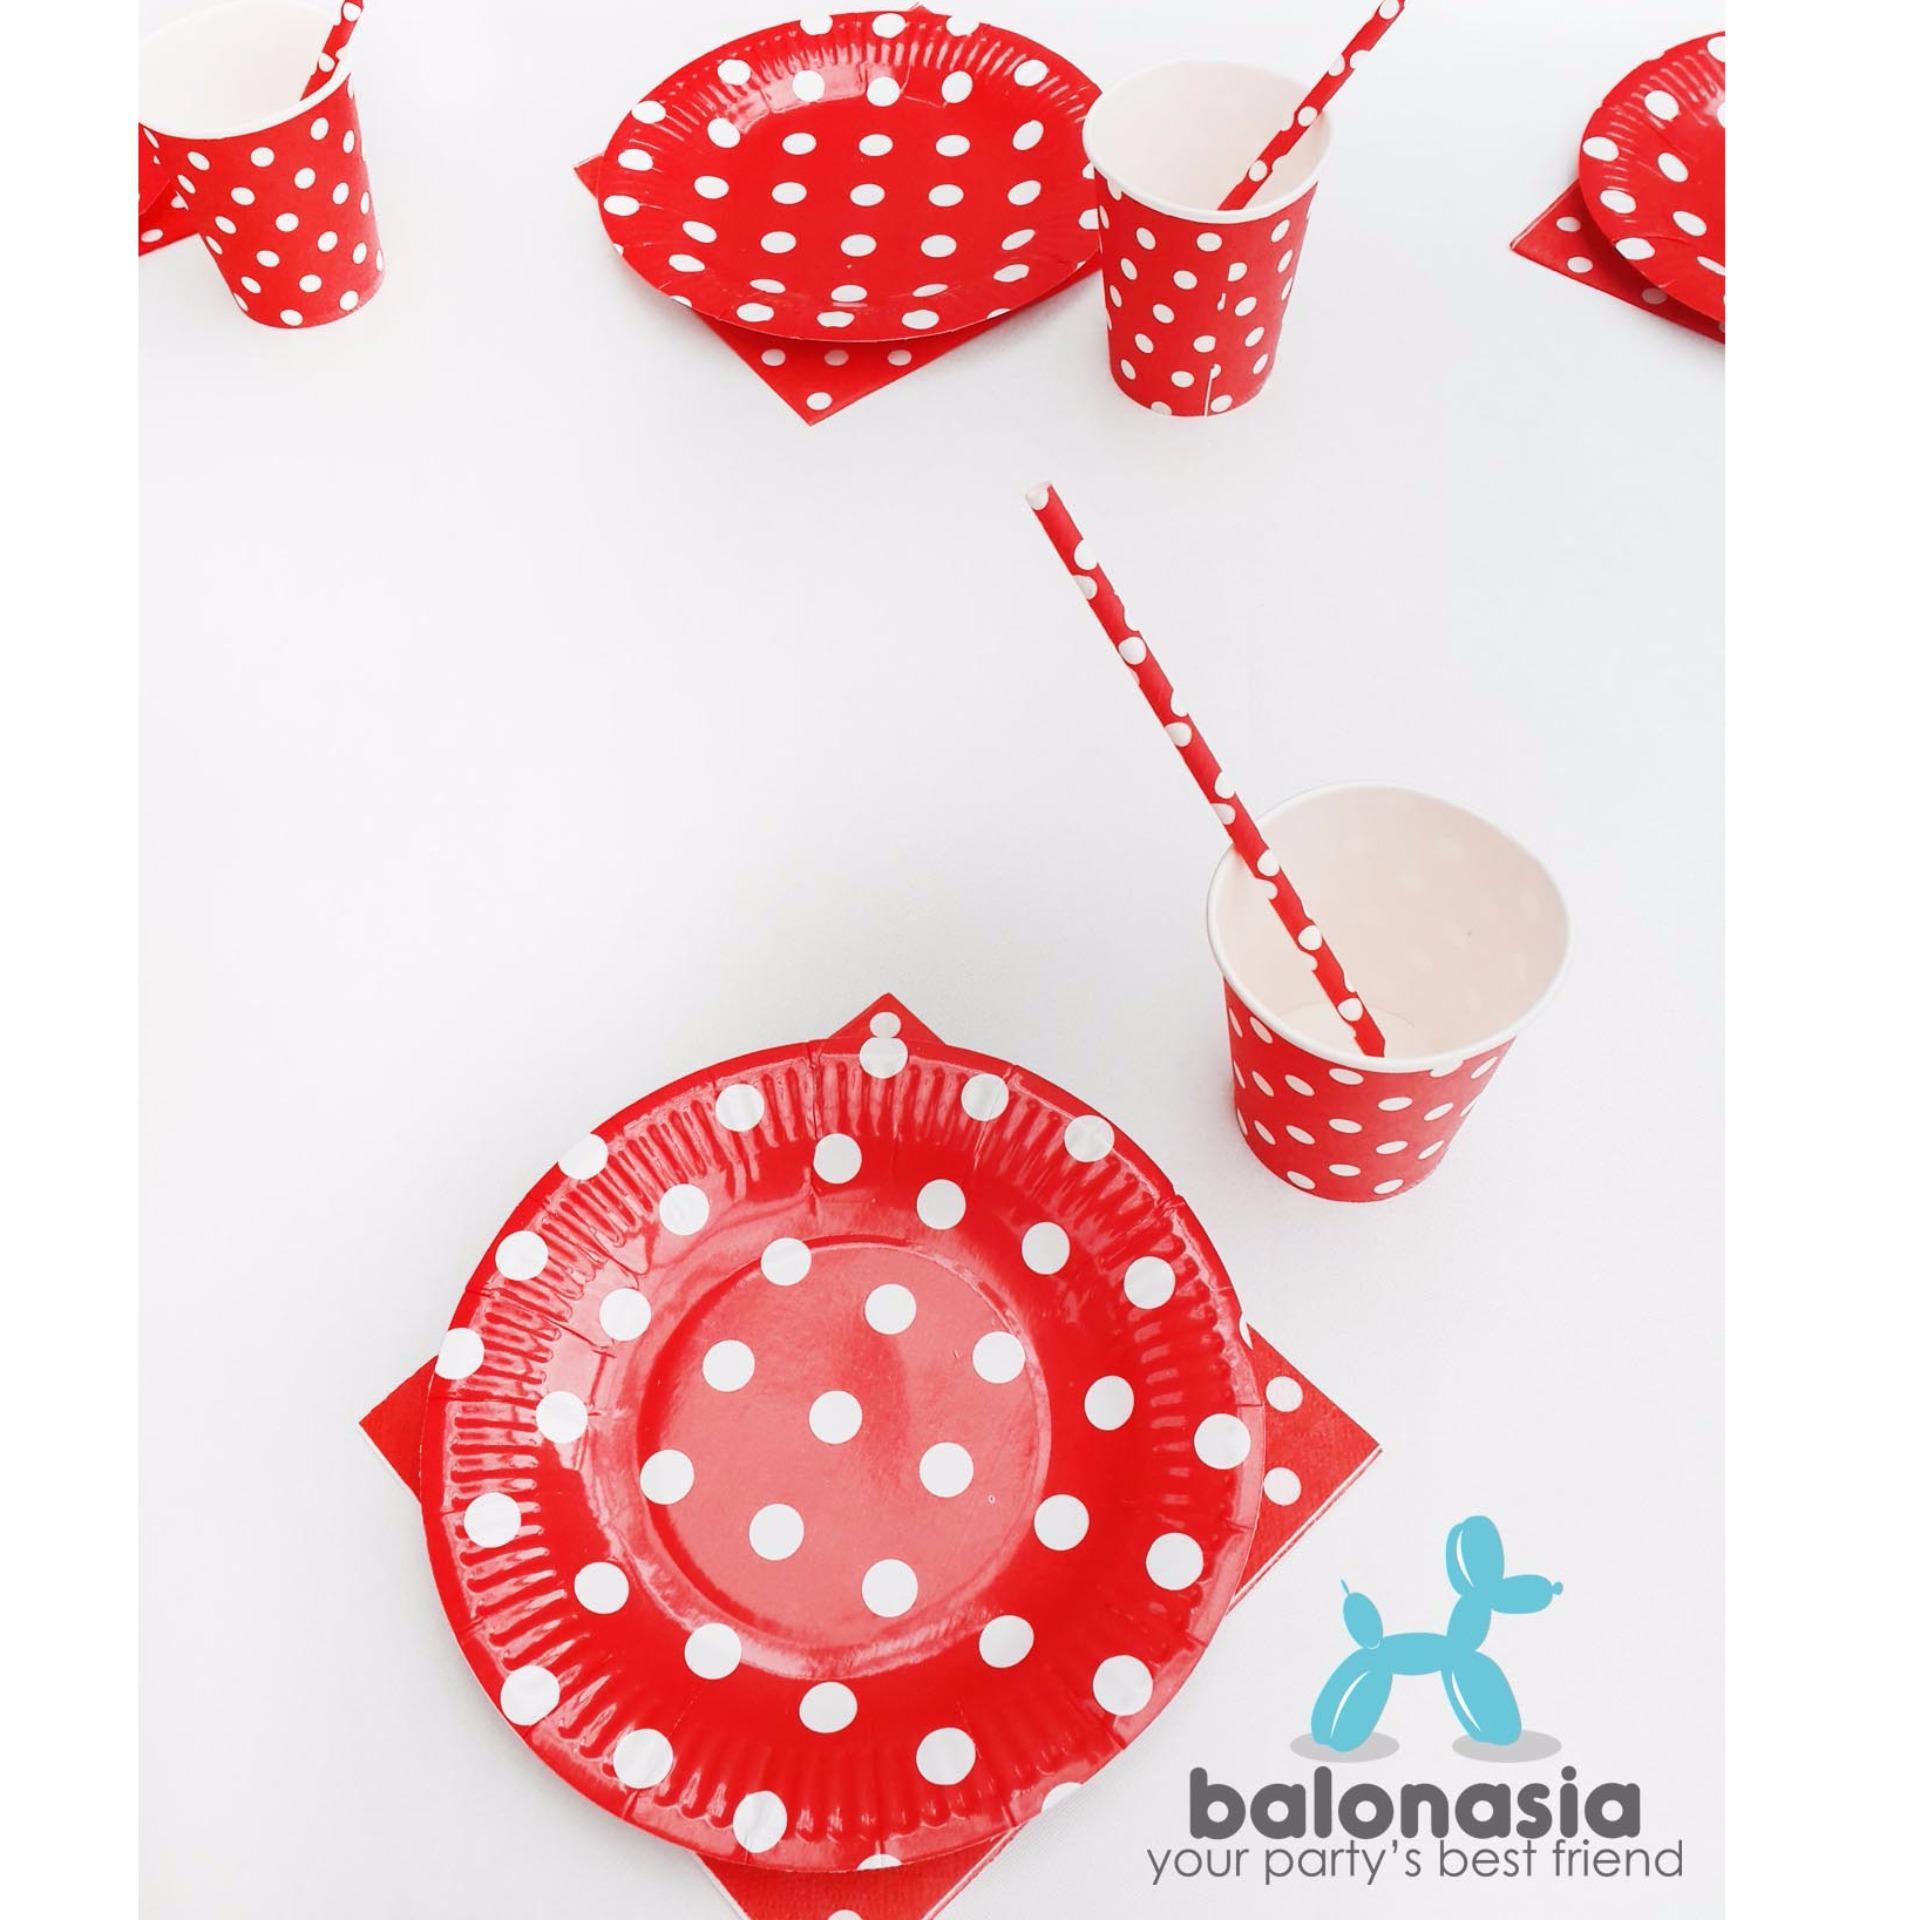 Balonasia Dekorasi Backdrop Set Ulang Tahun Cheerful Red Polkadot Tirai Foil Table Ware Party 10 Orang Anak